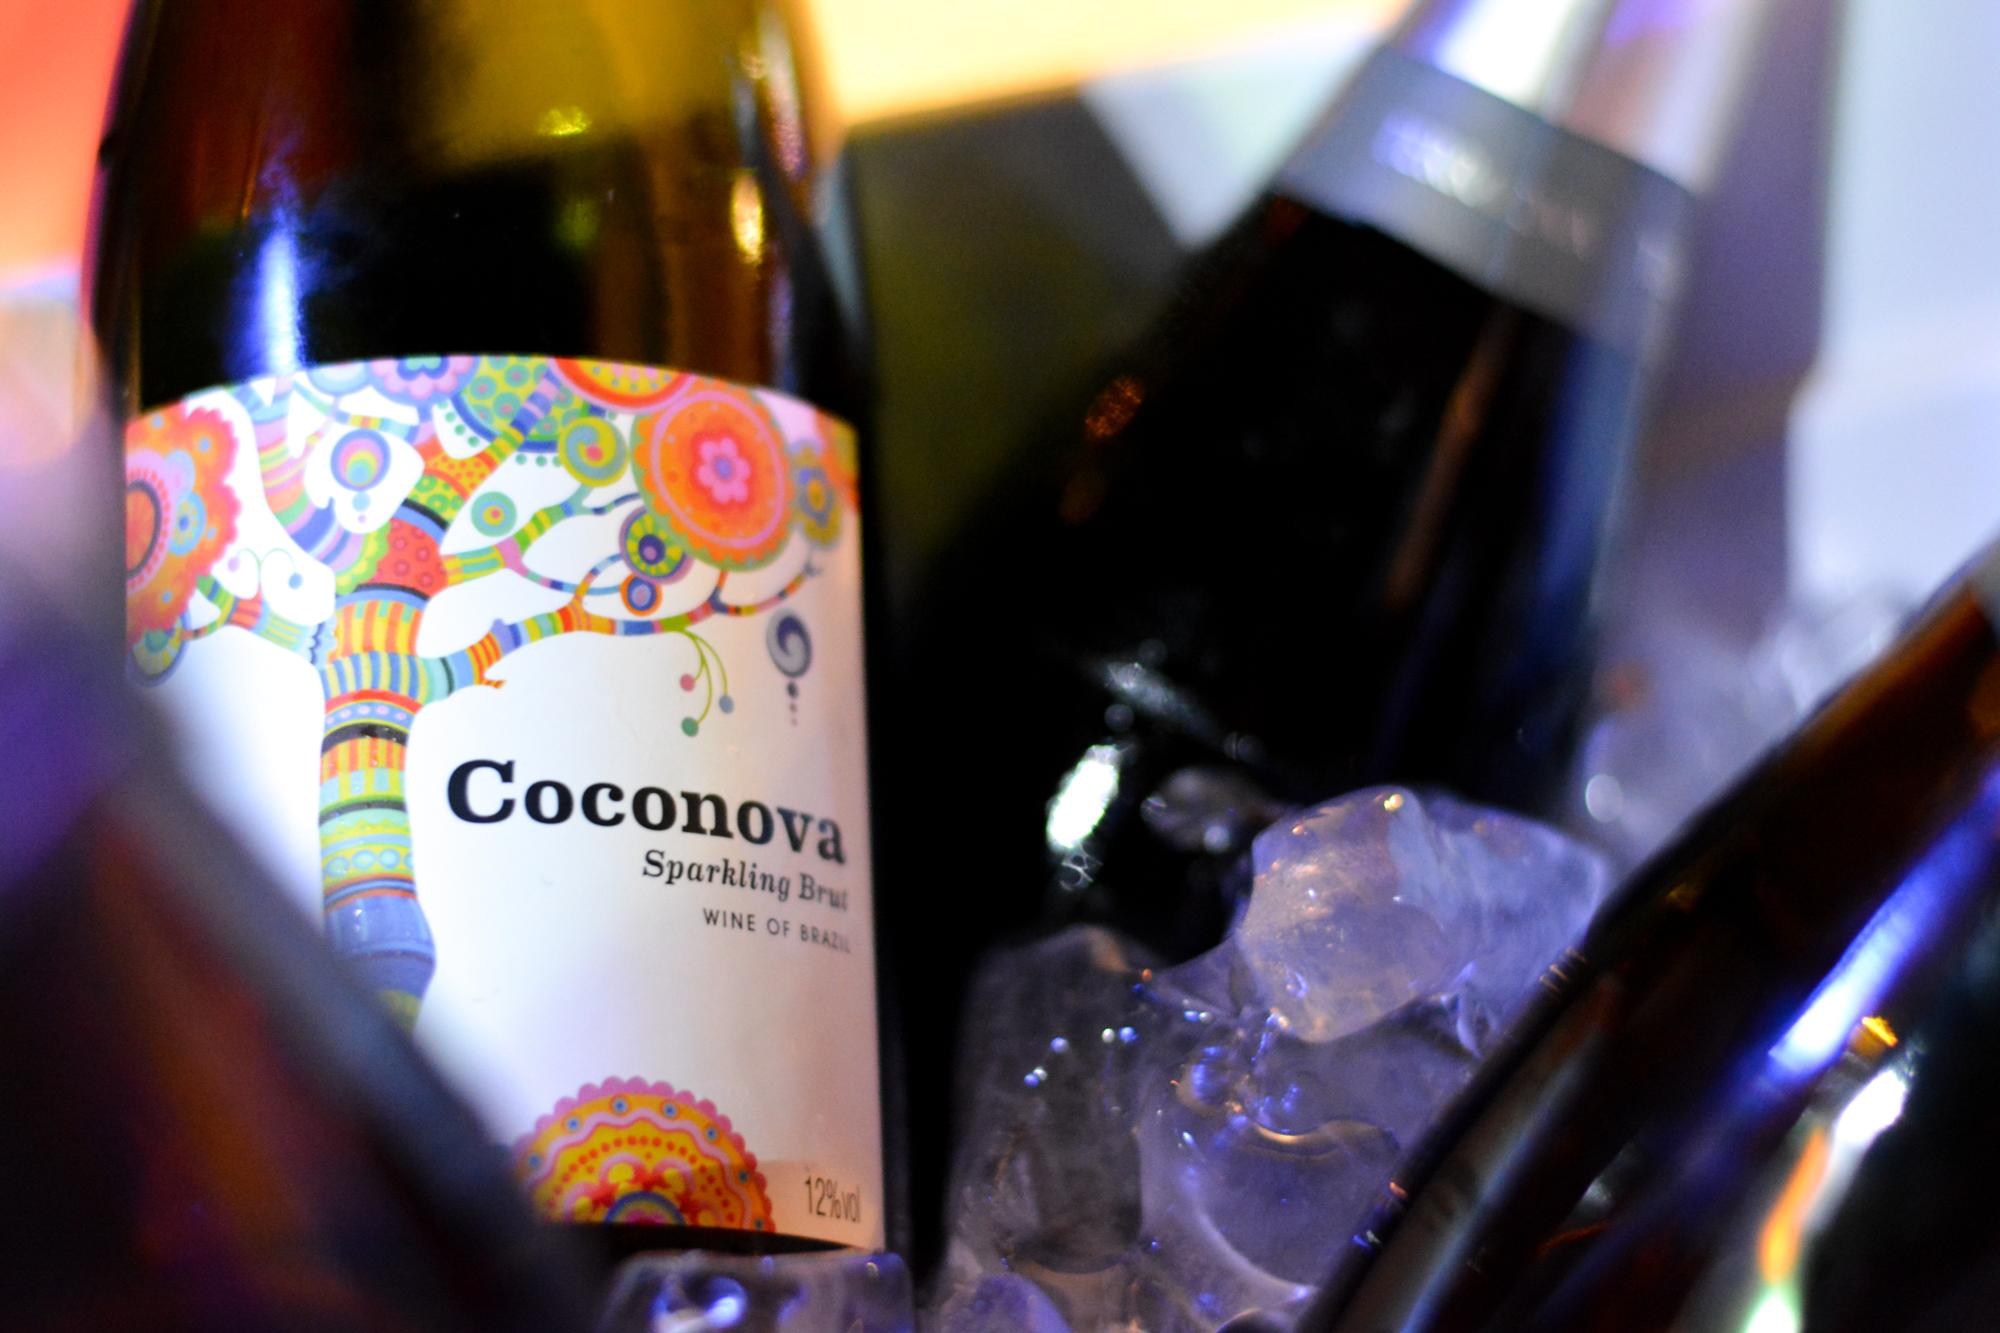 Espumante Terranova Brut turns into Coconova Sparkling Brut to hit international markets.JPG